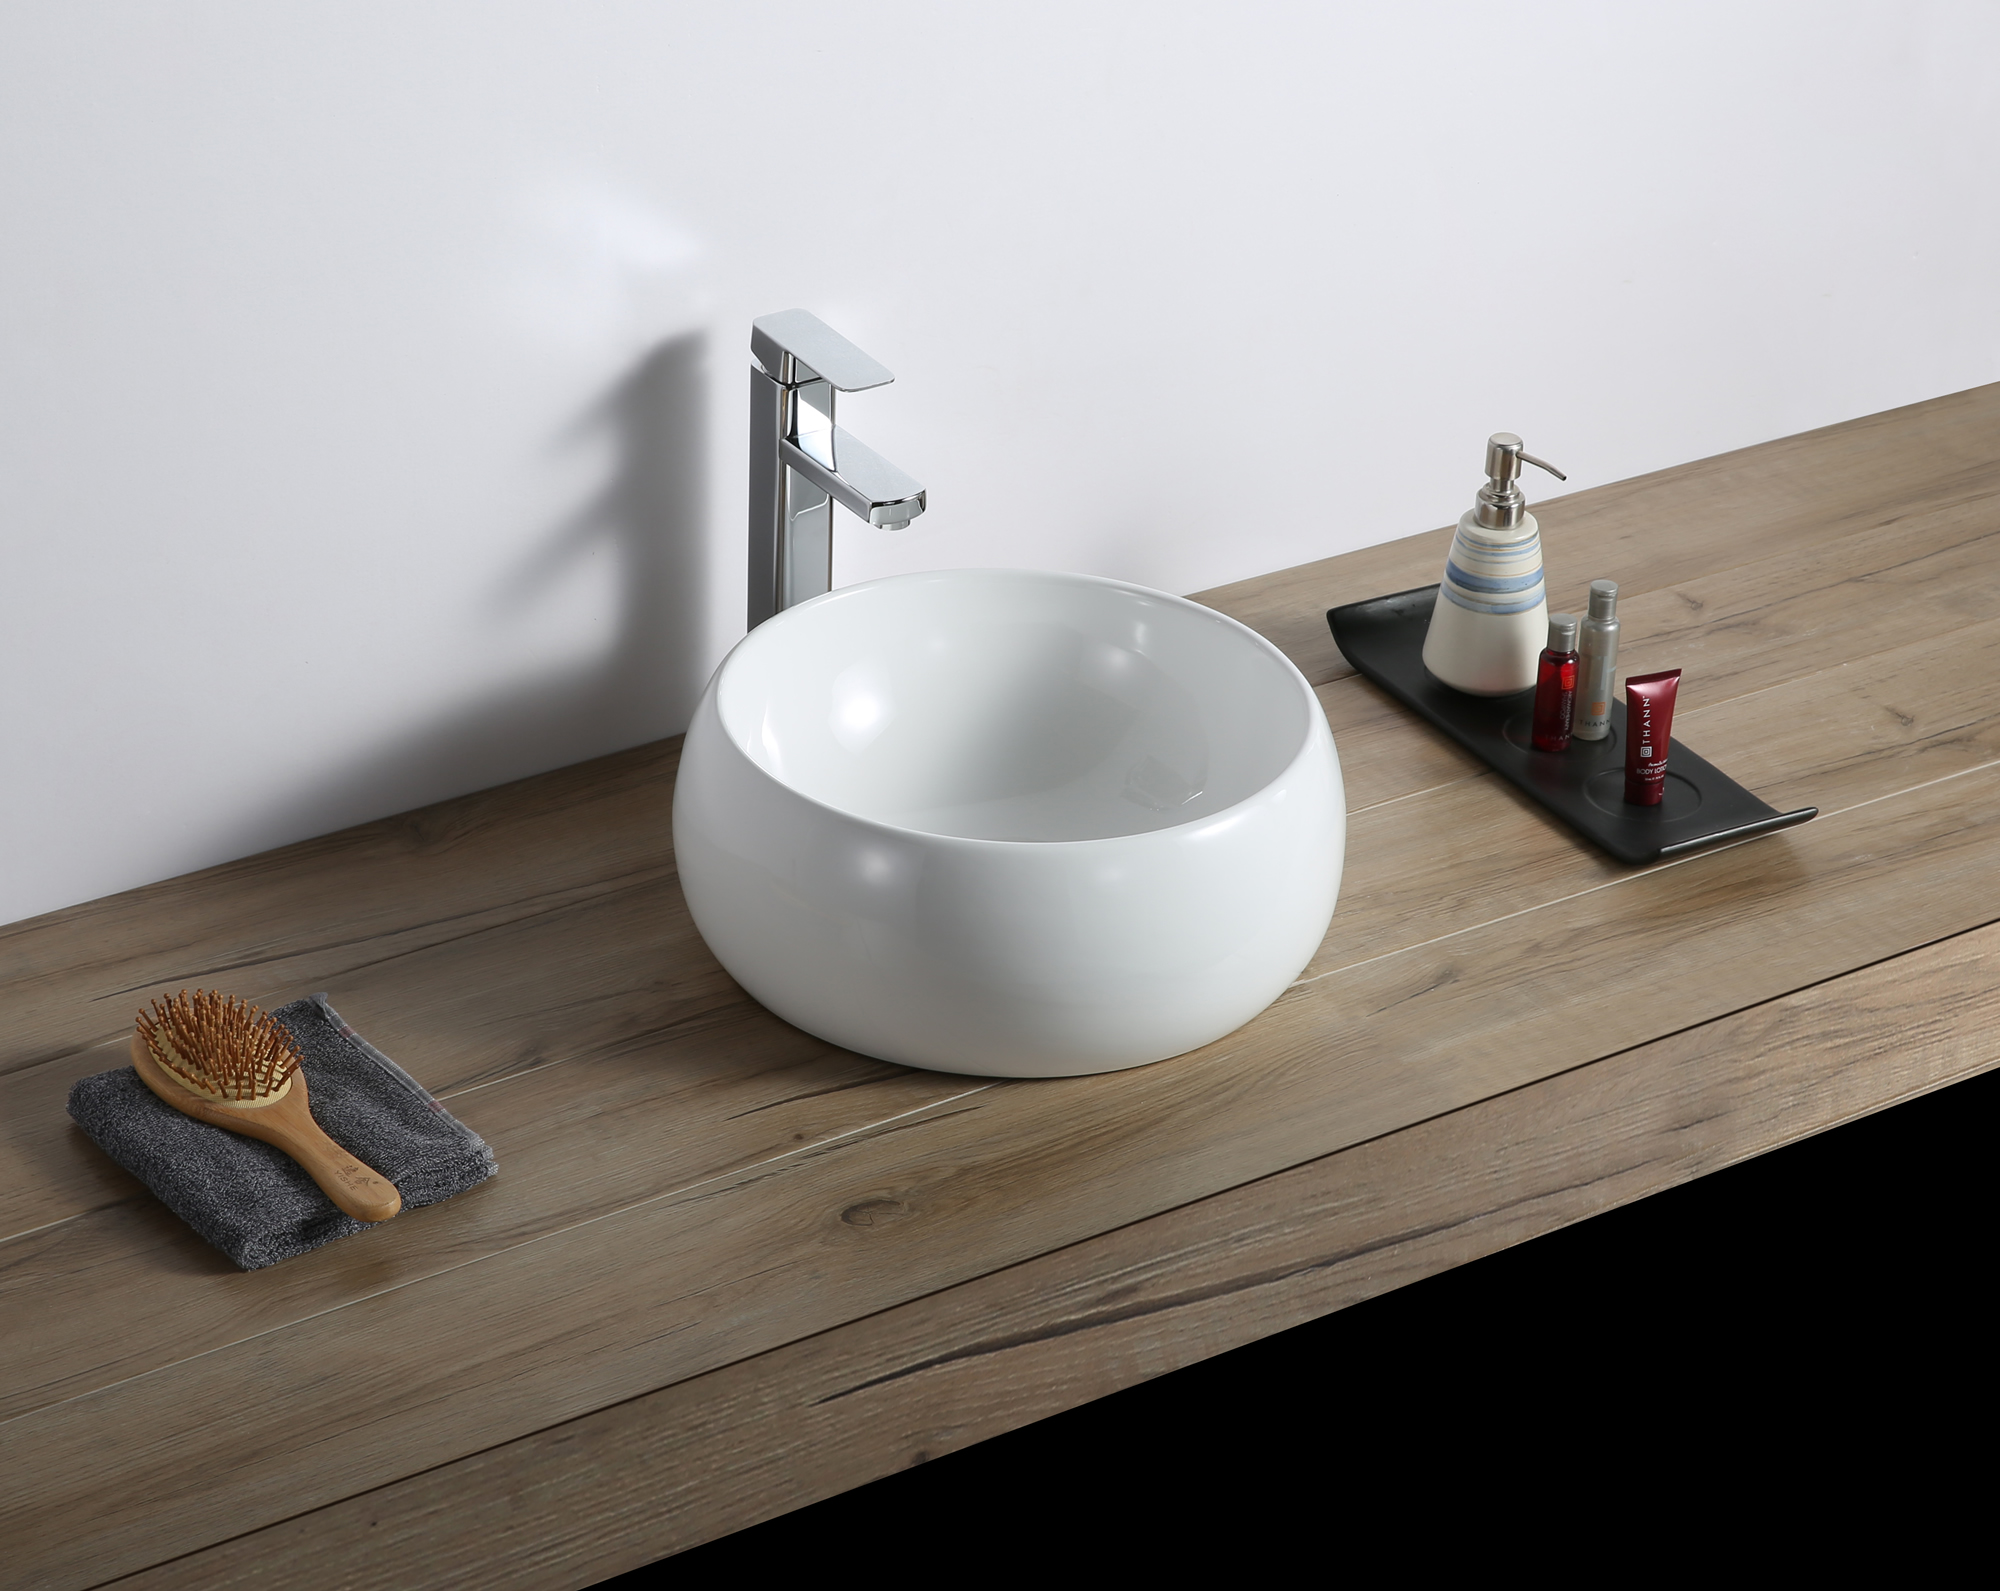 12 Inch Bathroom Vessel Sink Round White Circular Above Counter Porcelain Ceramic Ruvati Usa